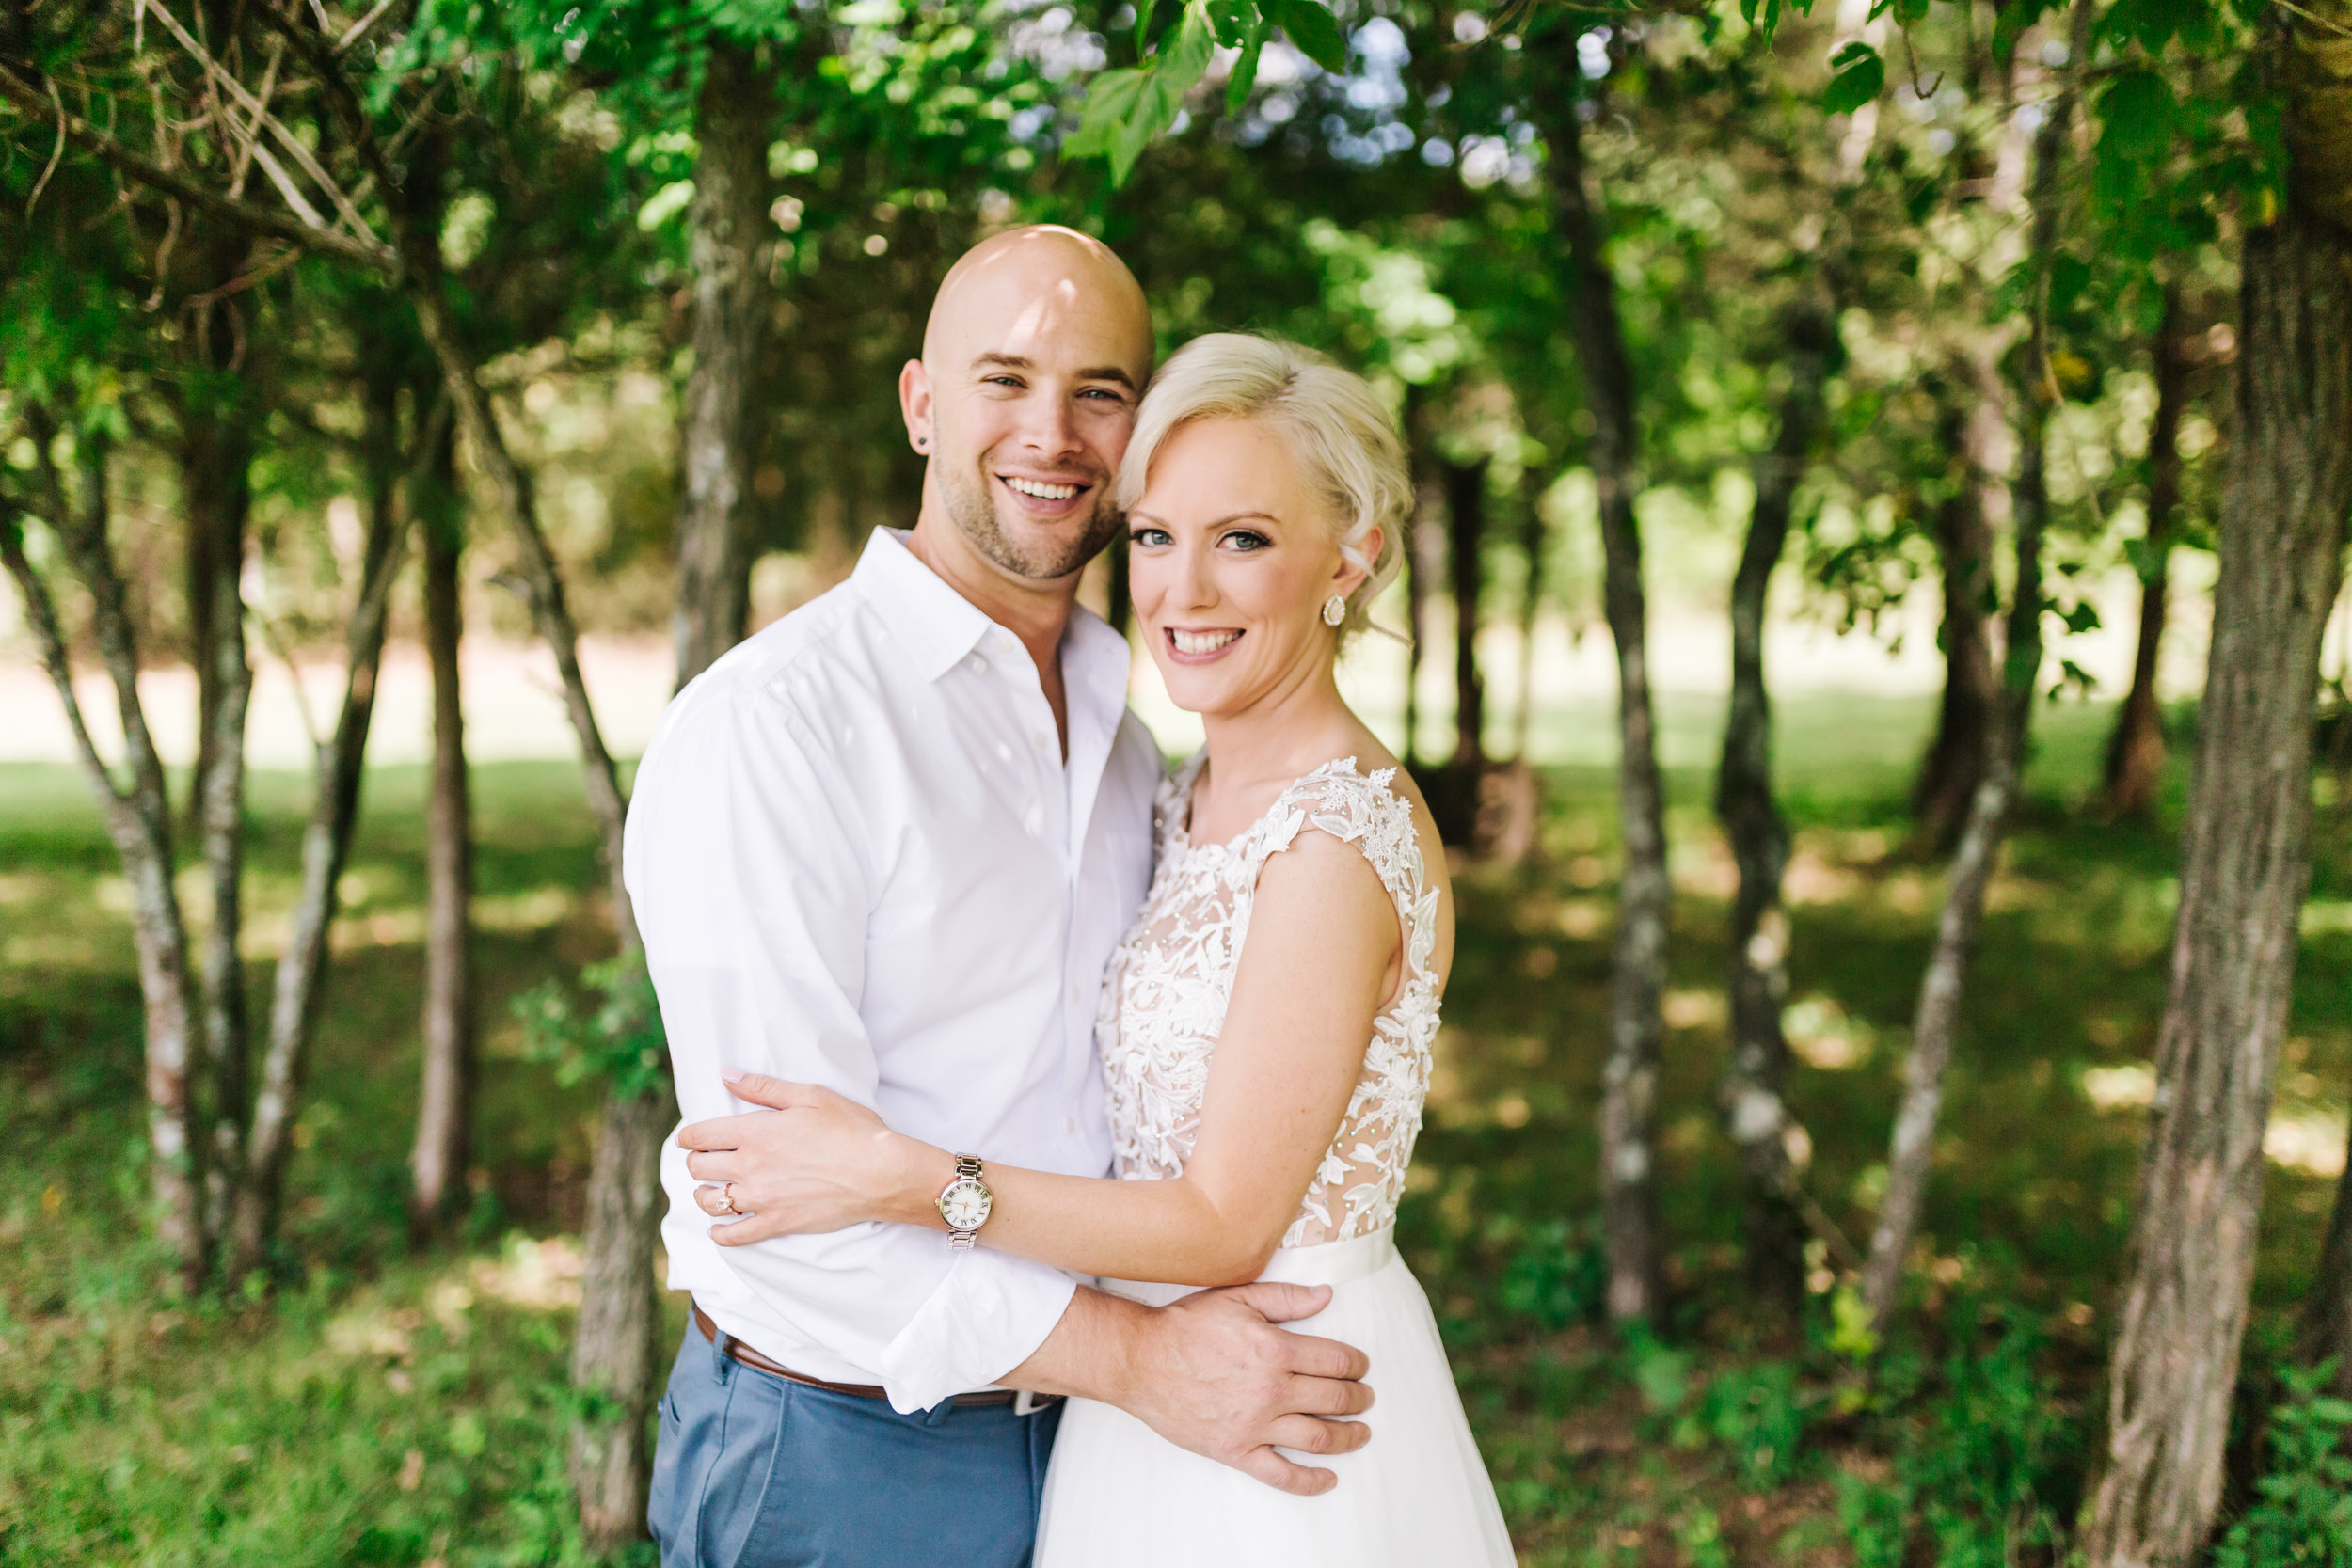 2018.09.02 Ray and Sarah Prizner Nashville TN Wedding FINALS-196.jpg